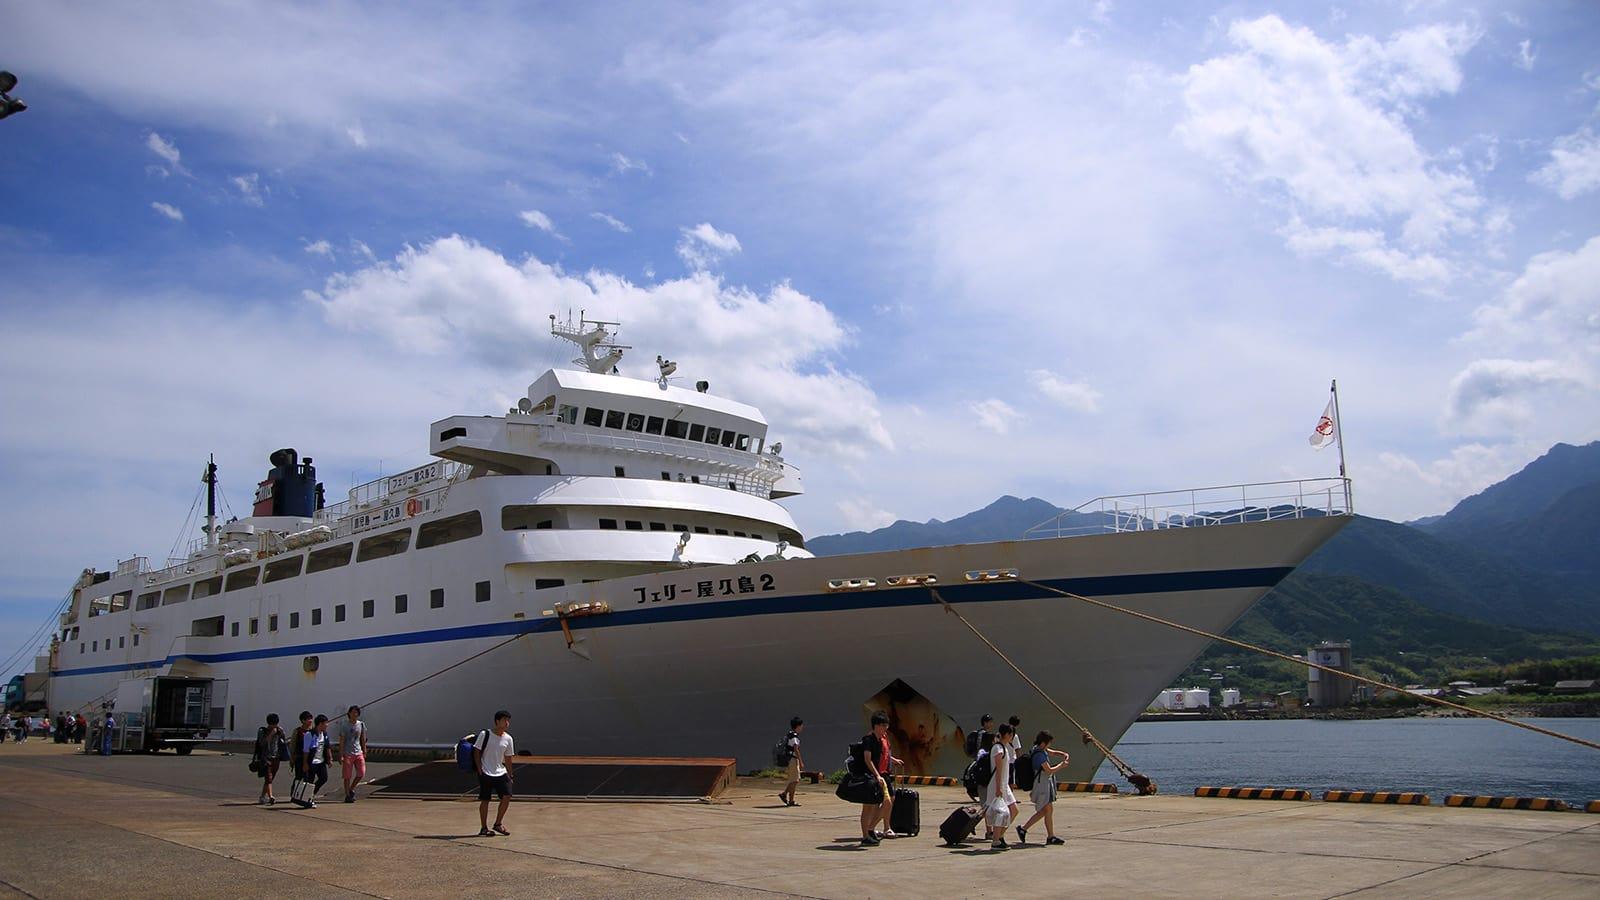 tàu du lịch yakushima